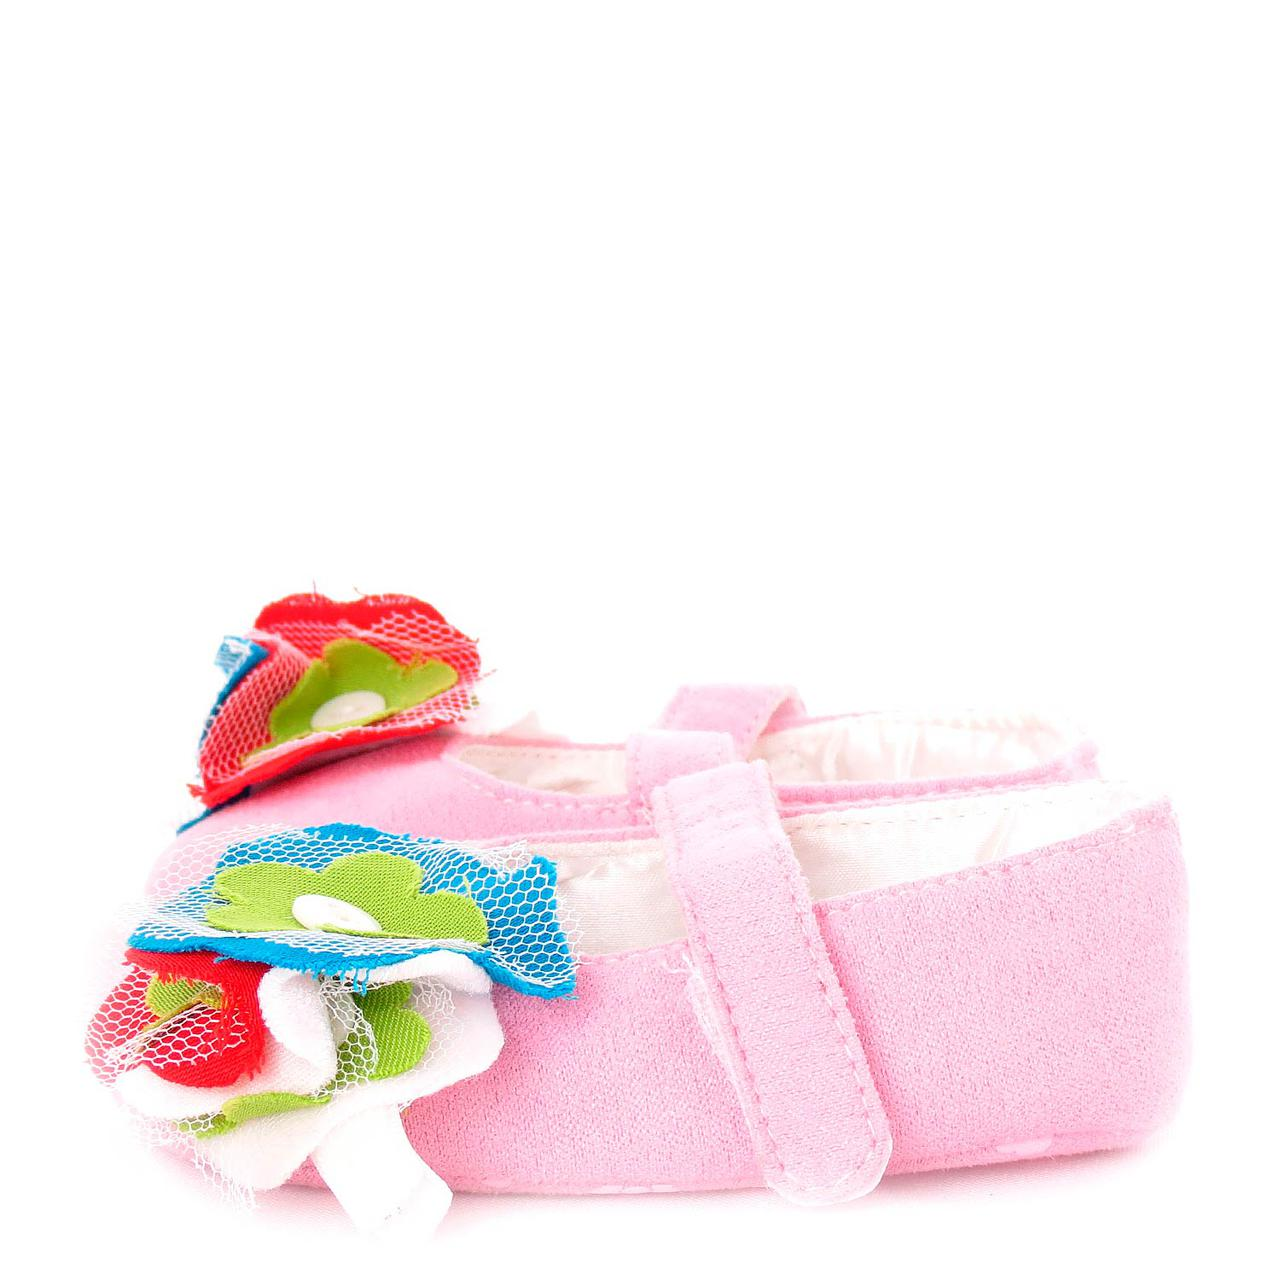 Пинетки для девочки Весна Berni Розовые